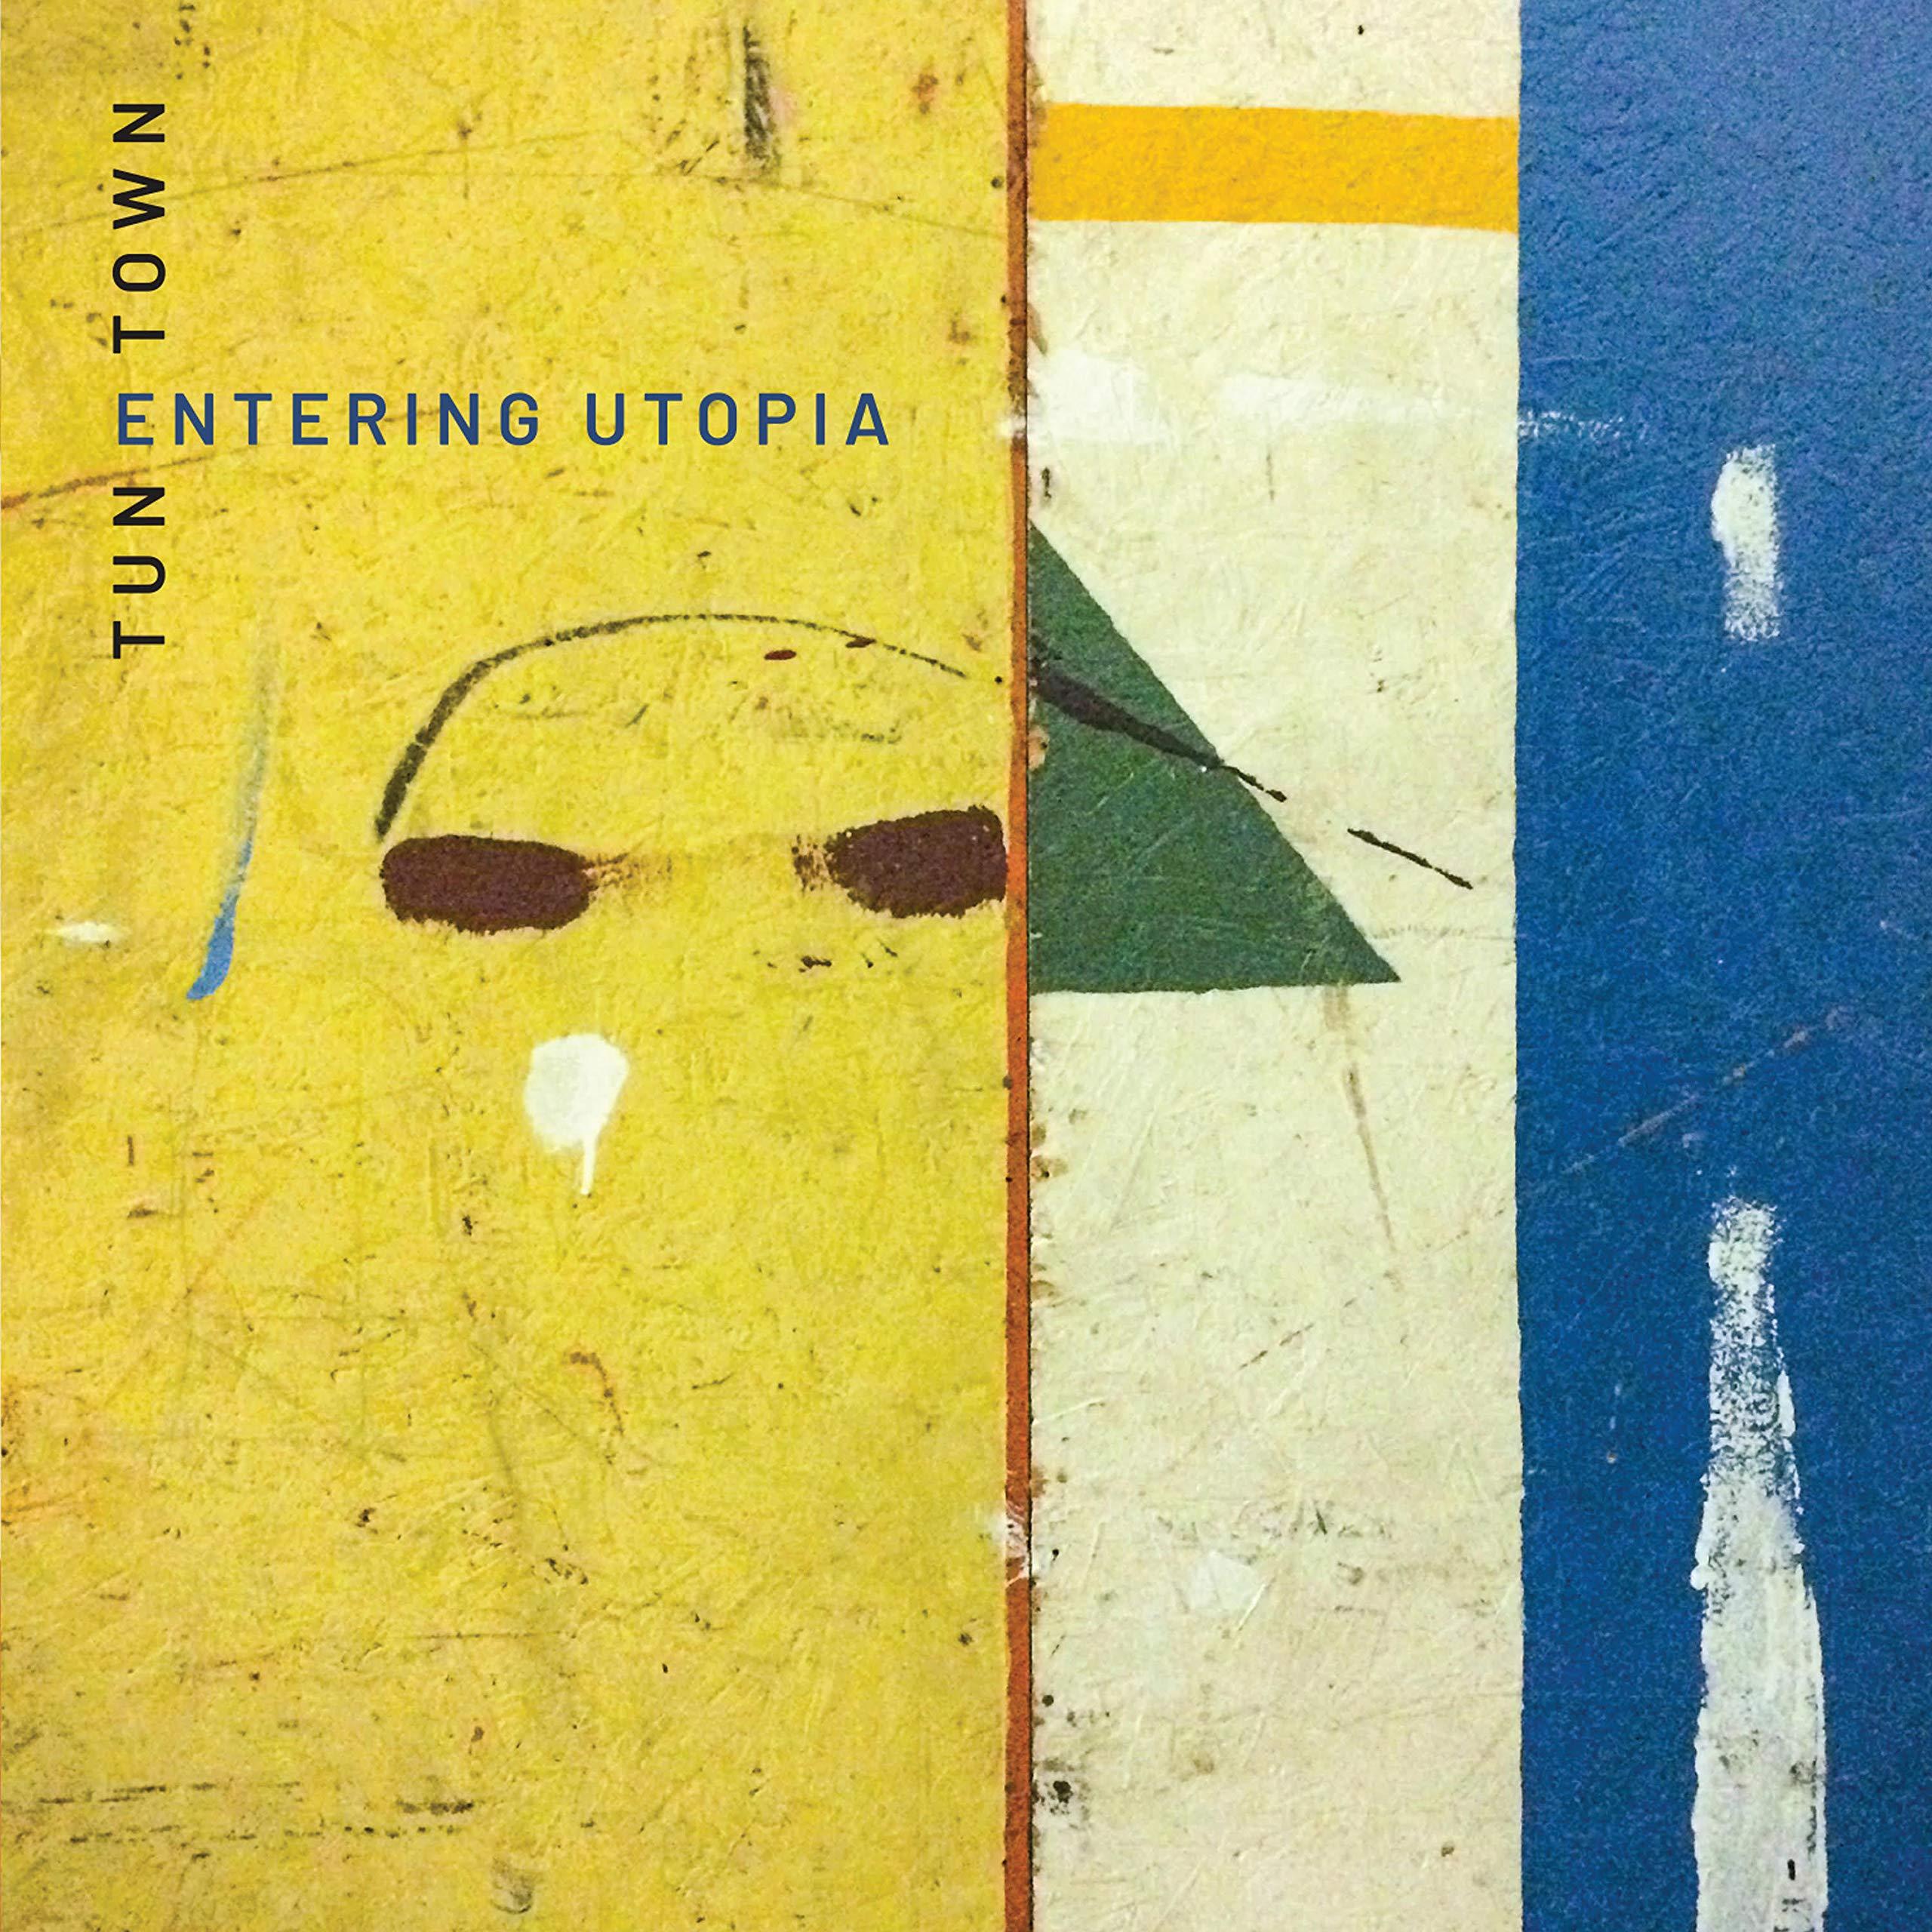 TuneTown - Entering Utopia (2021) [FLAC] Download